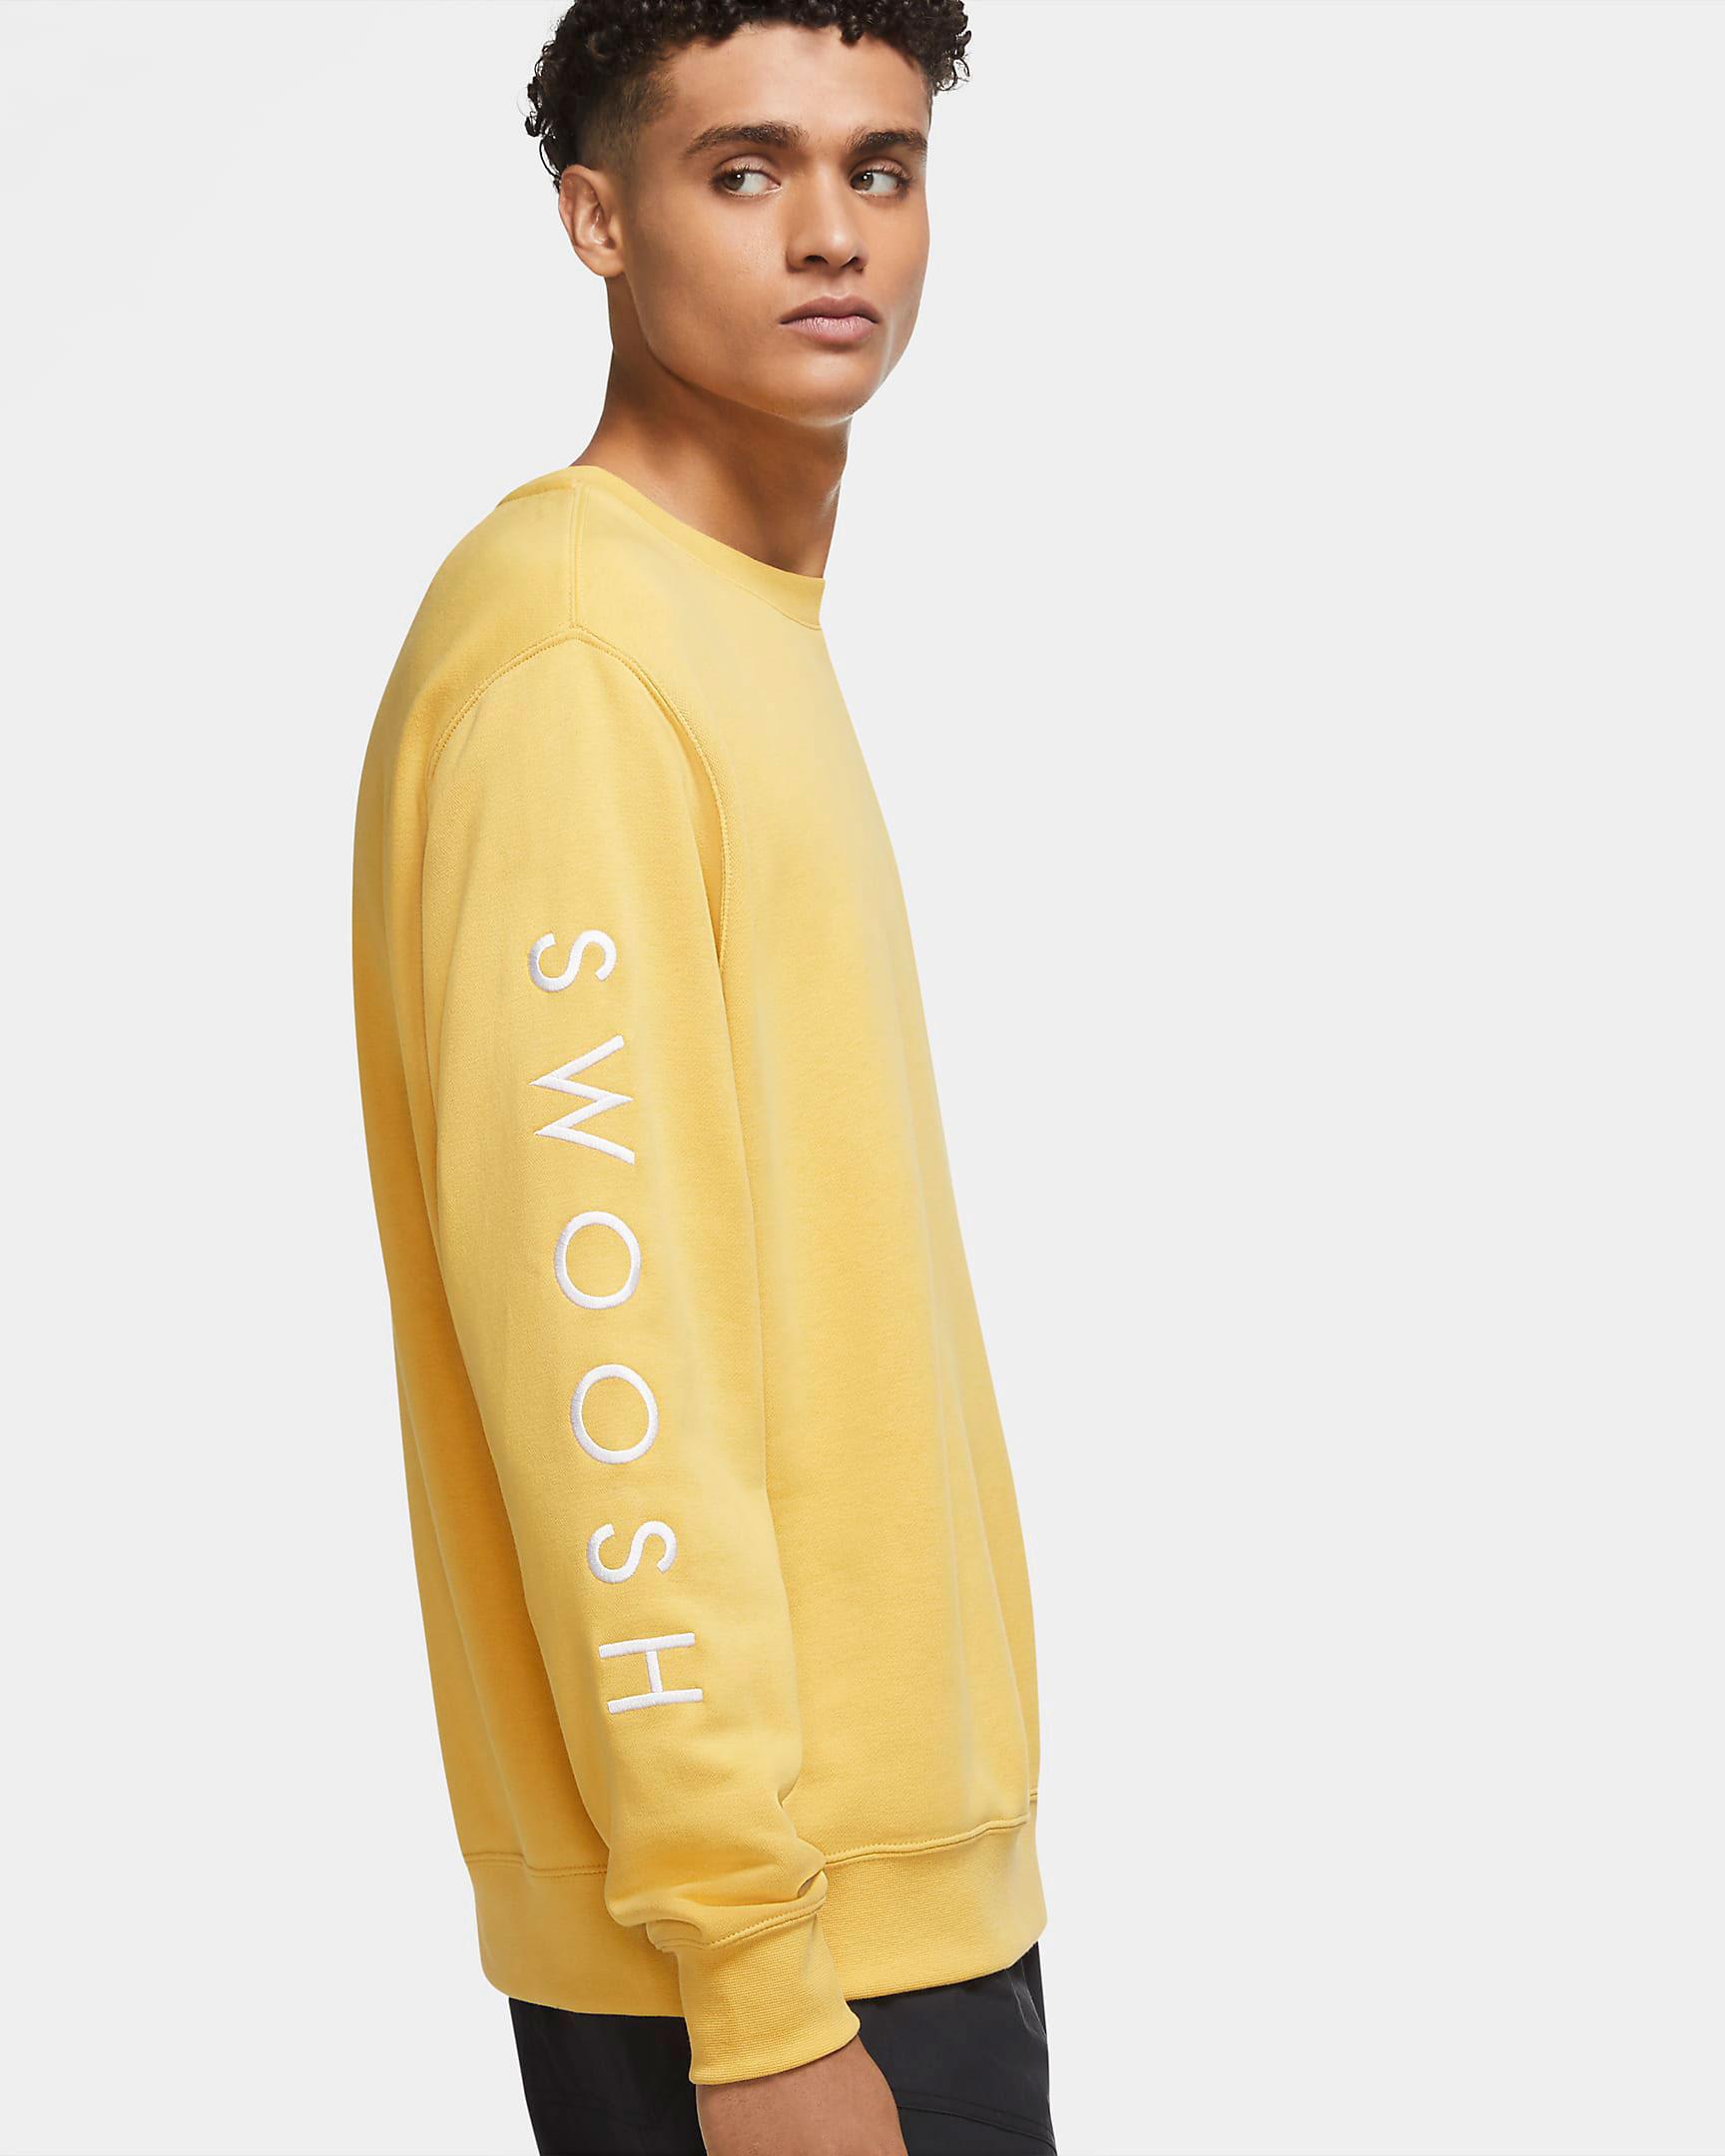 nike-air-max-1-lemonade-sweatshirt-match-2